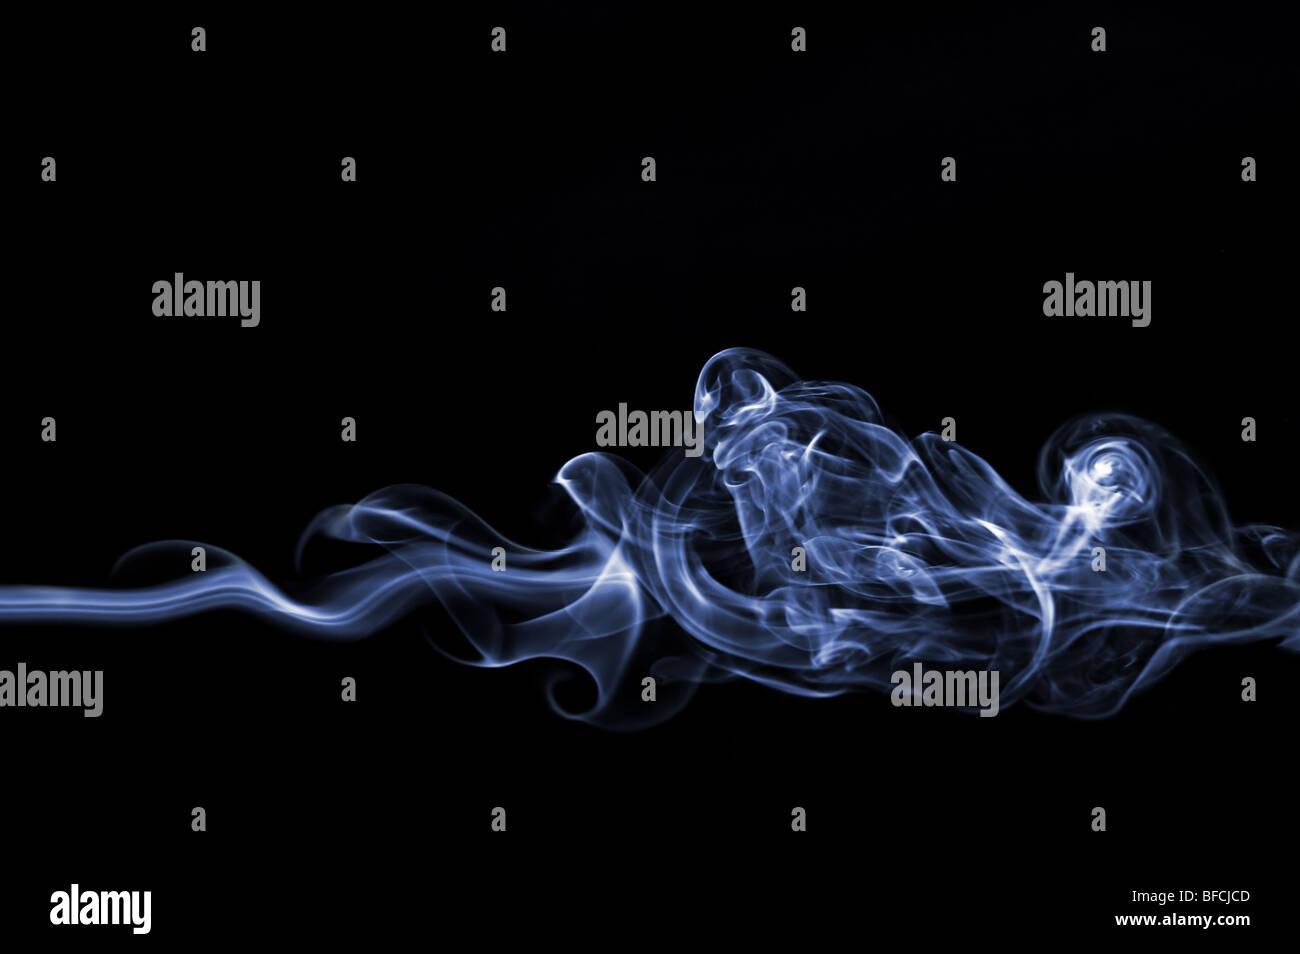 Smoke swirl on black background - Stock Image